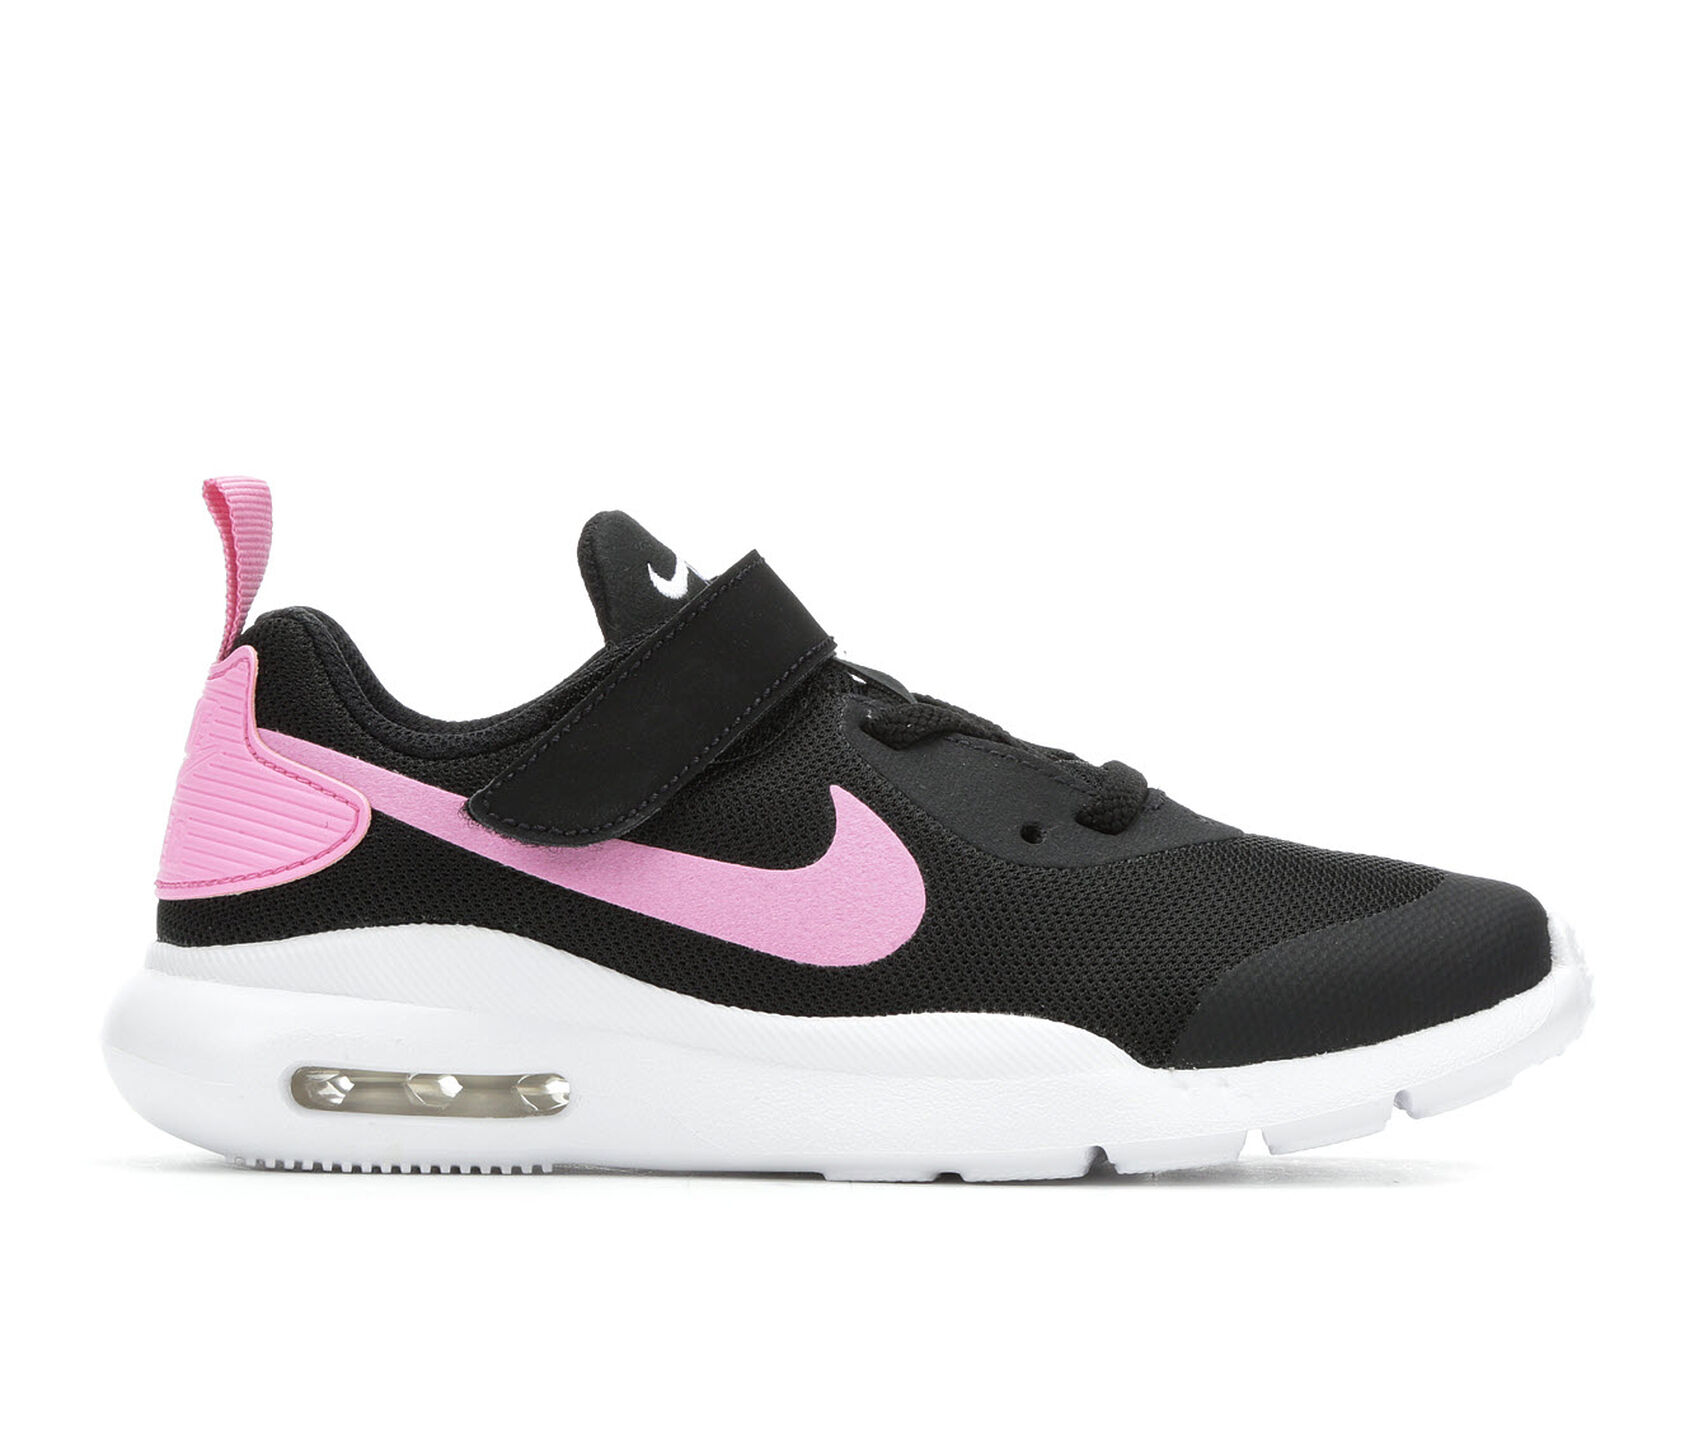 quality design ba34d 3c792 Girls' Nike Little Kid Air Max Oketo Running Shoes